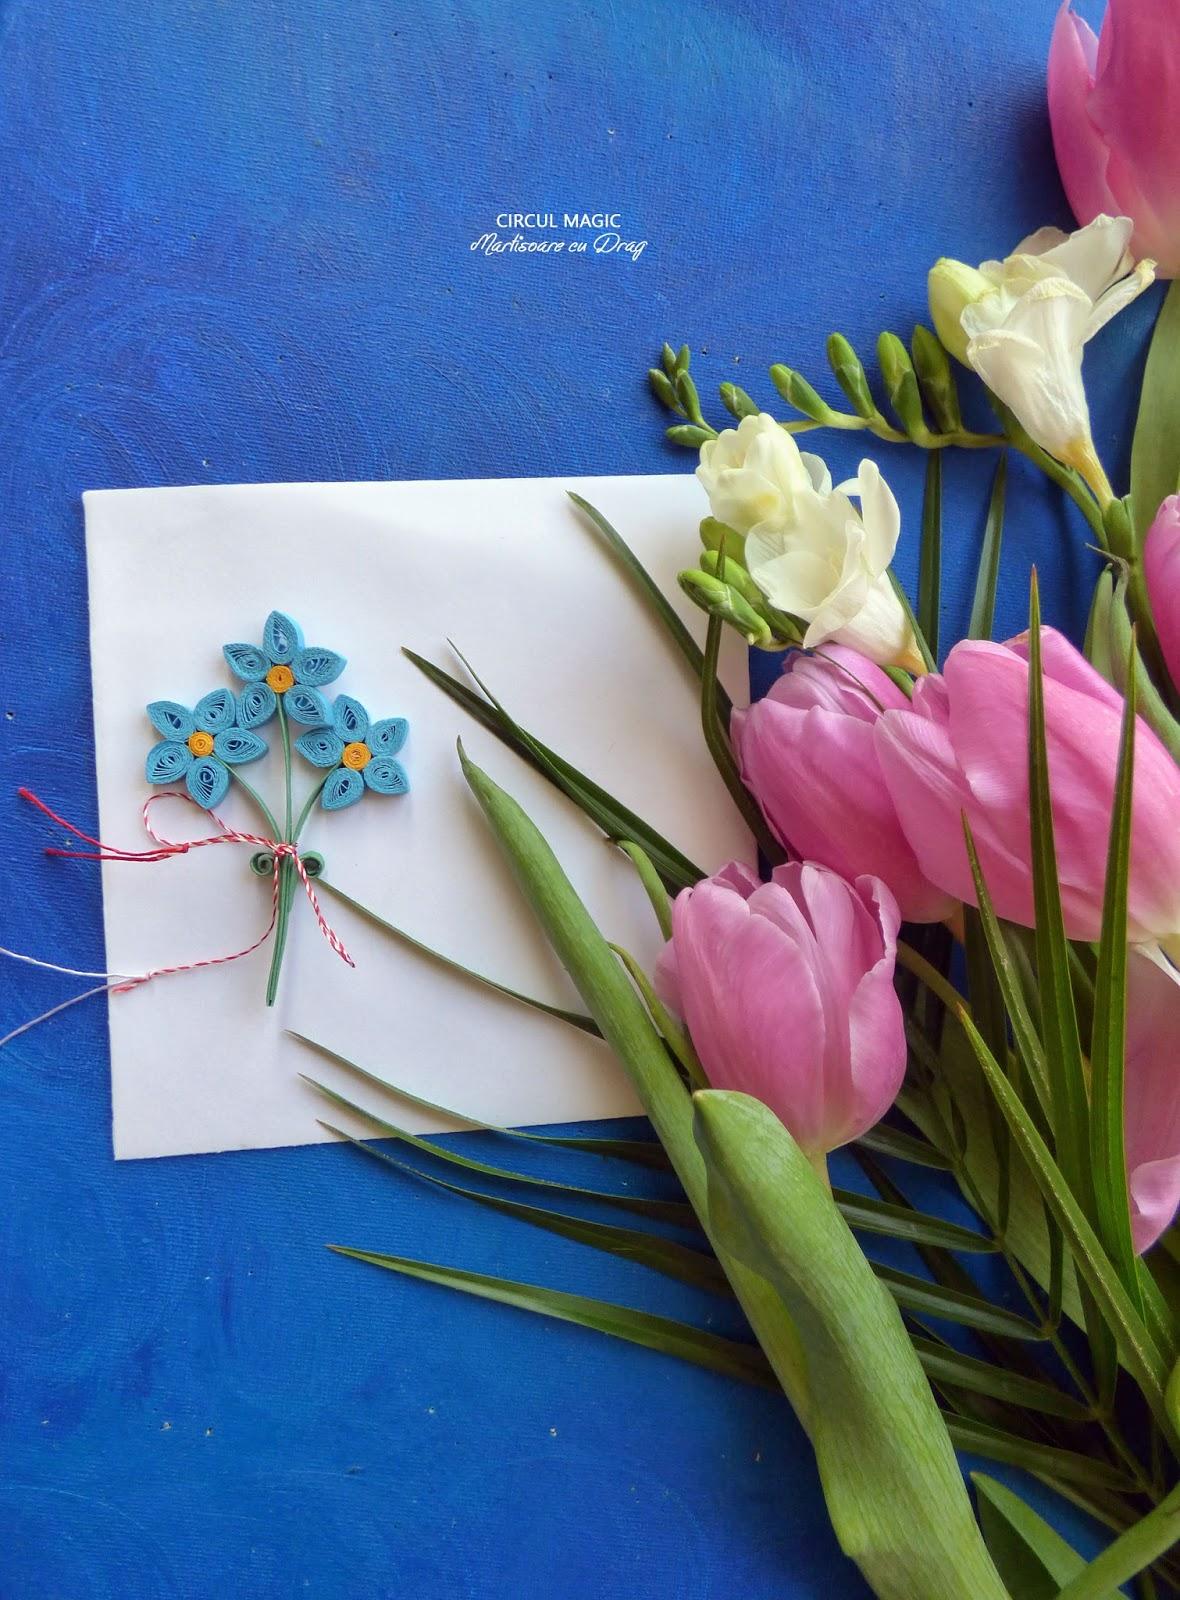 Martisoare Quilling 2017 Flori de Nu Ma Uita Handmade Circul Magicq